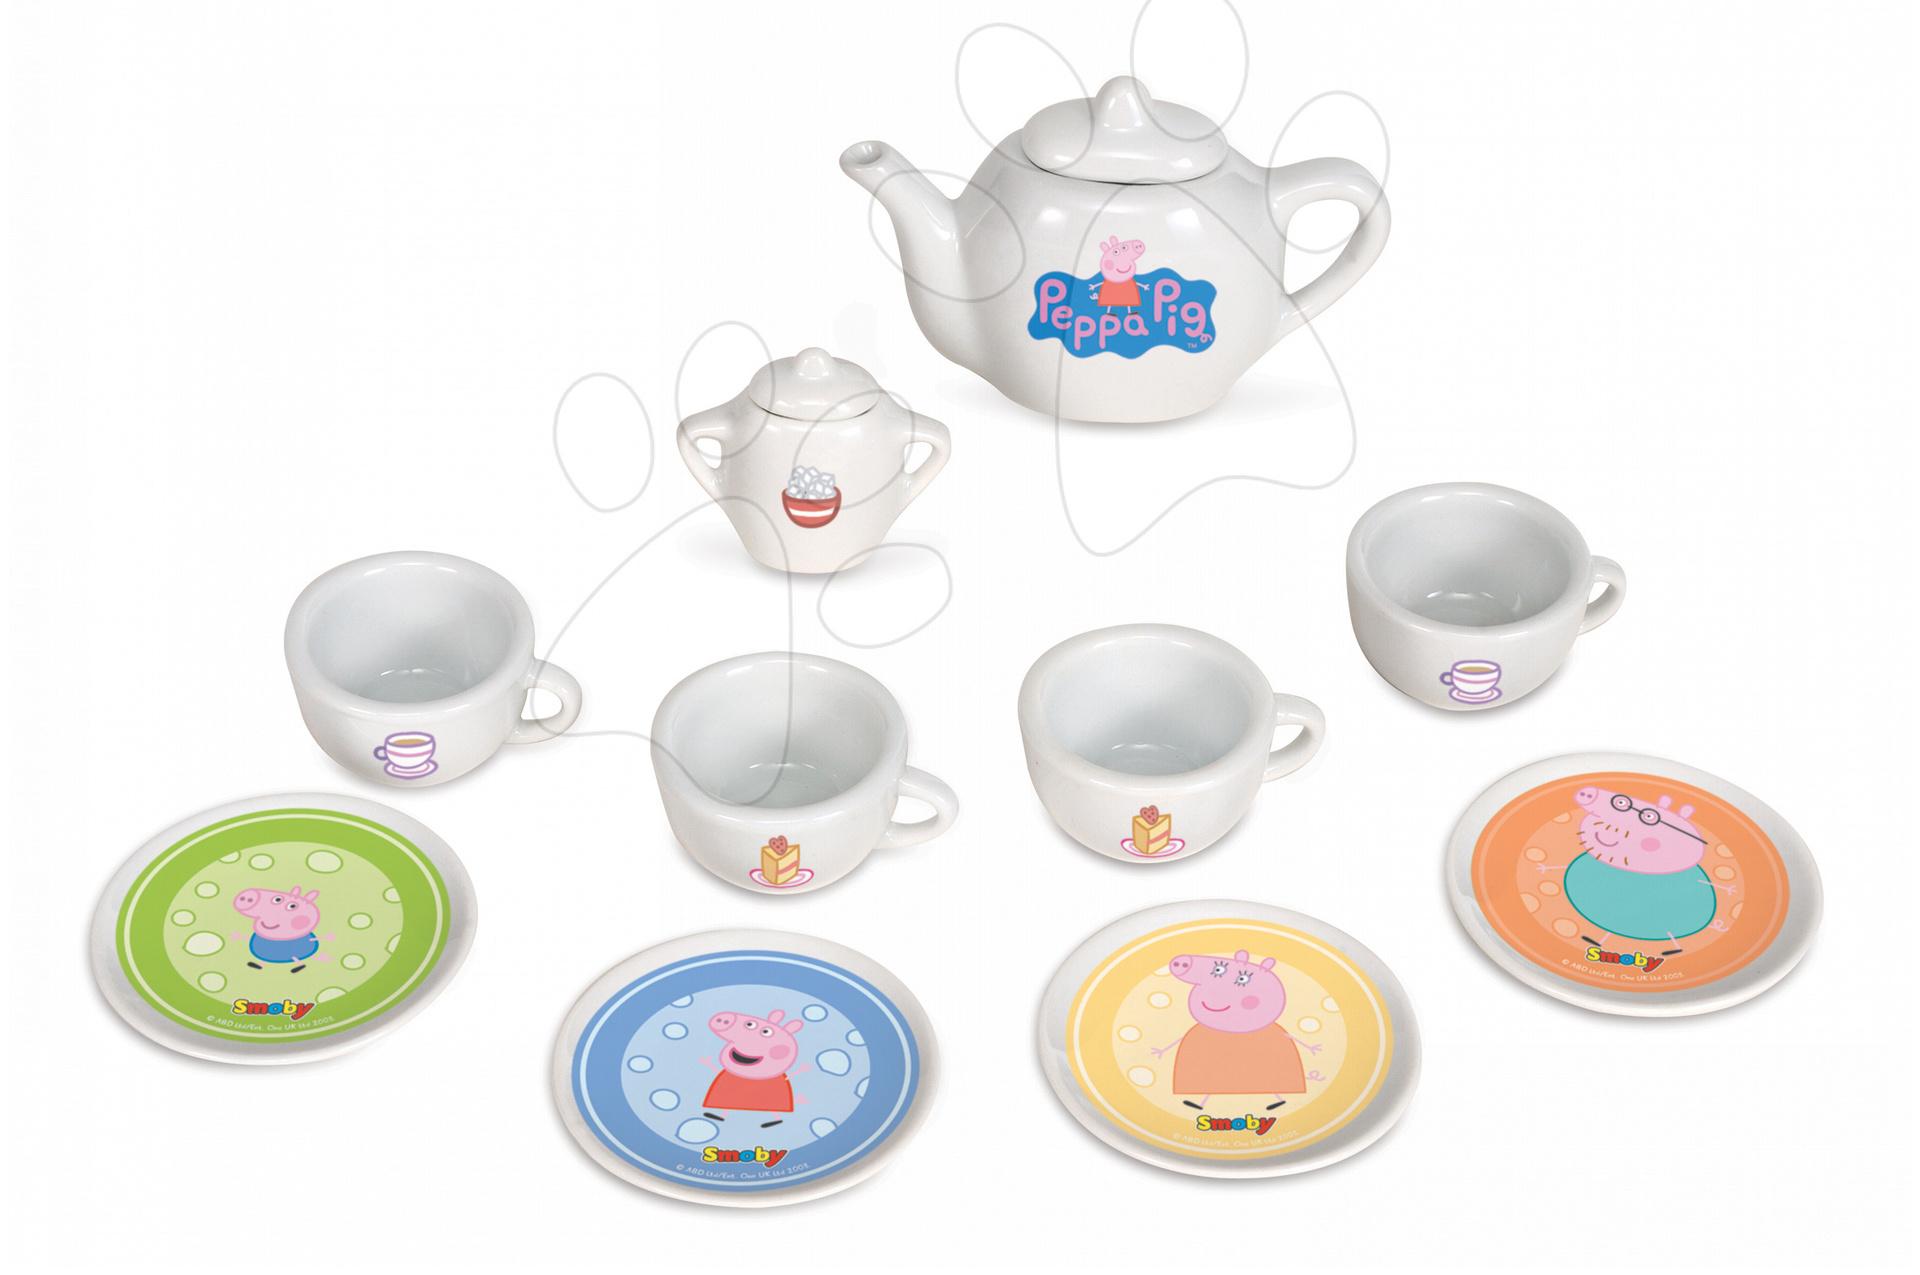 Riadíky a doplnky kuchynky - Peppa Pig porcelánový čajový set Smoby 12 kusový